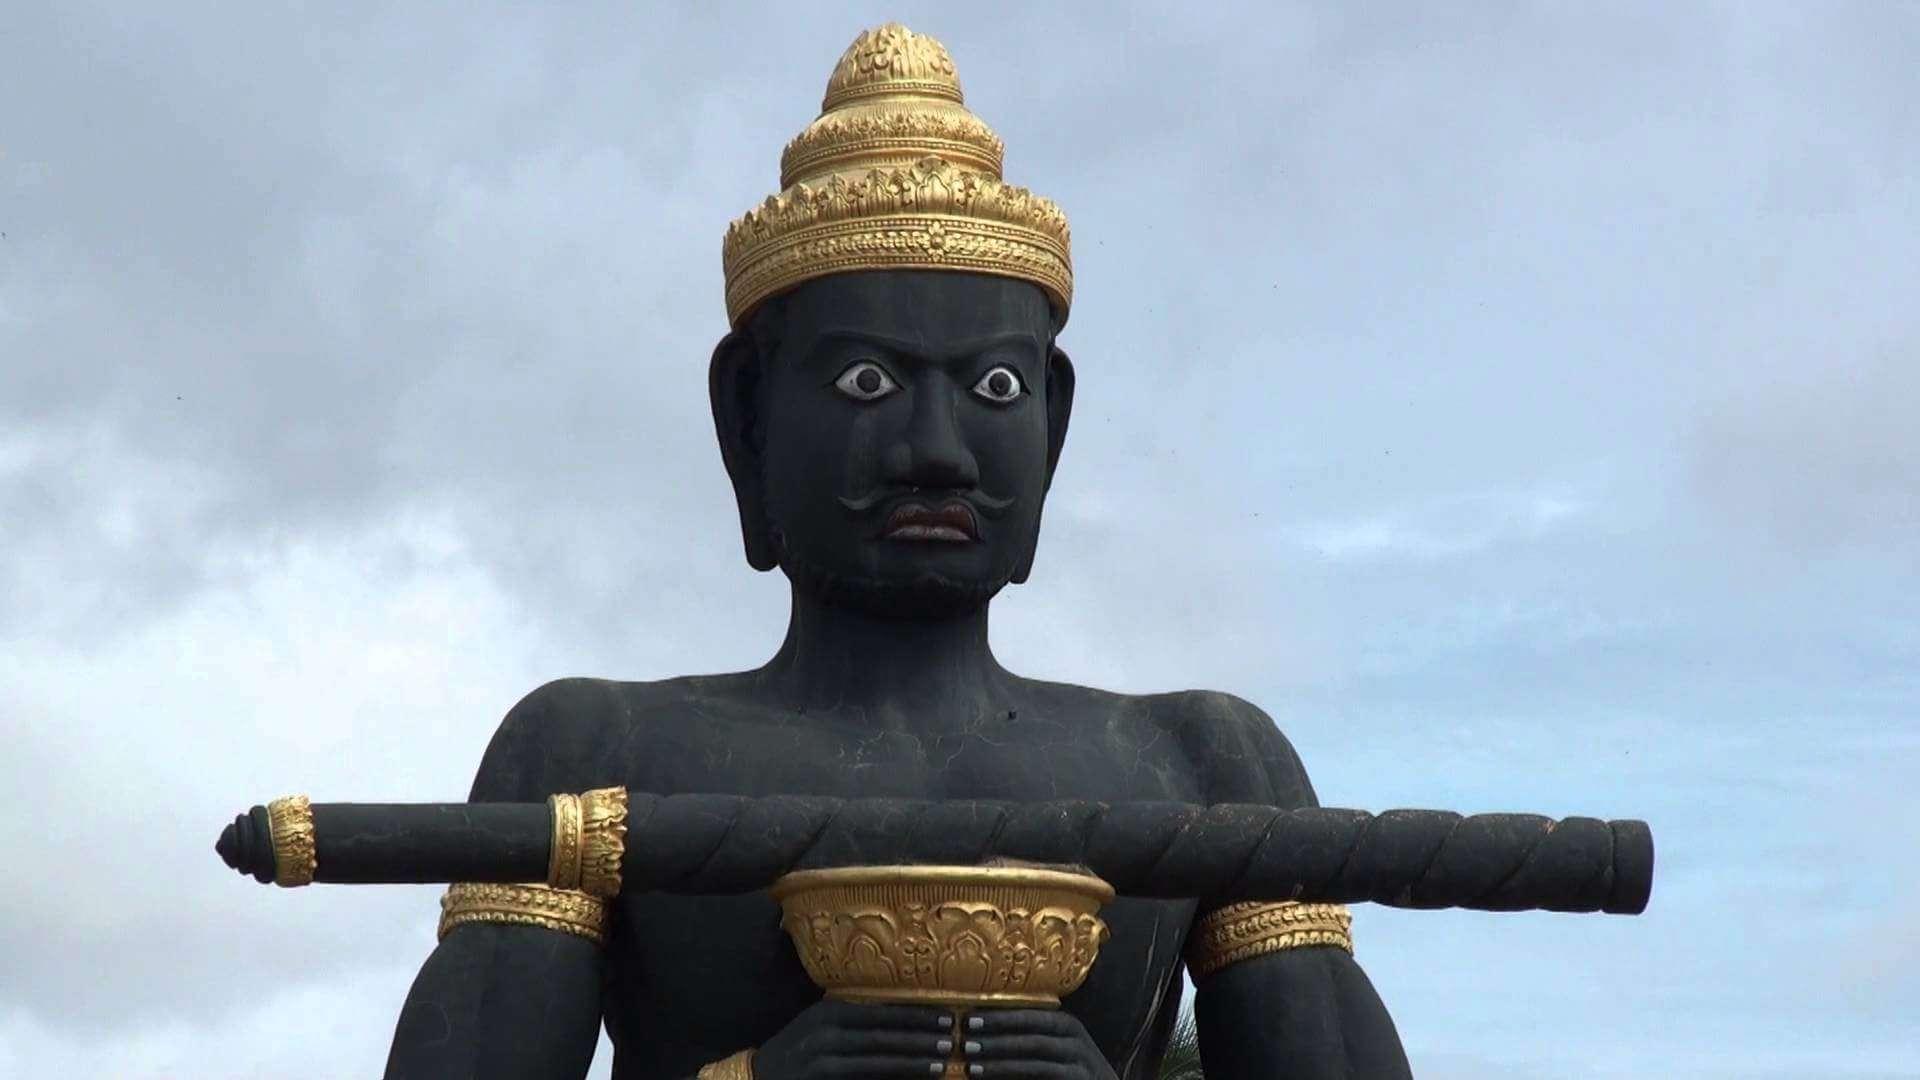 Ta Dambong Statue